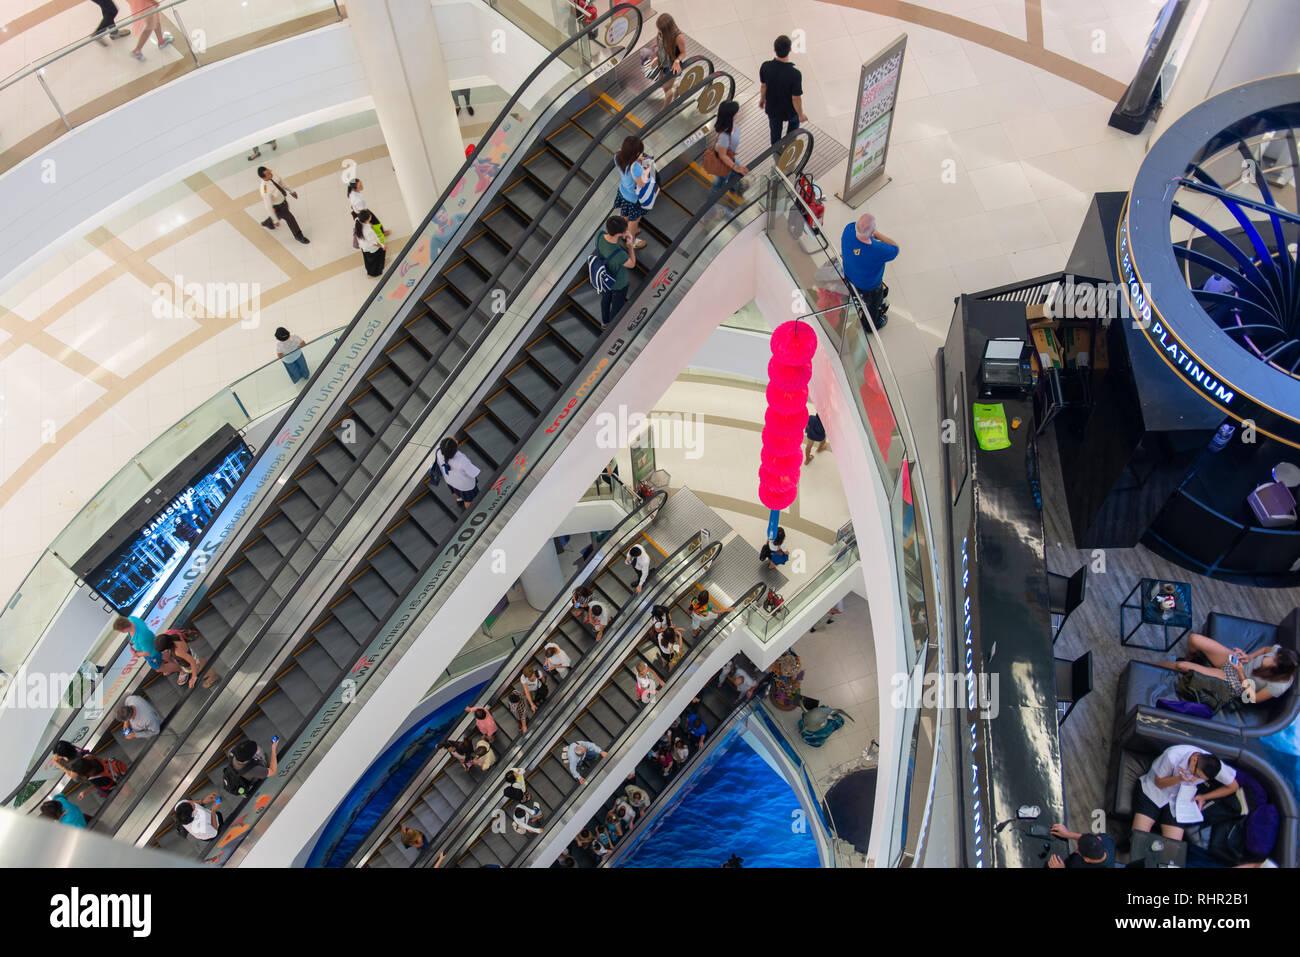 inside of siam paragaon shoping centre in Bangkok - Stock Image